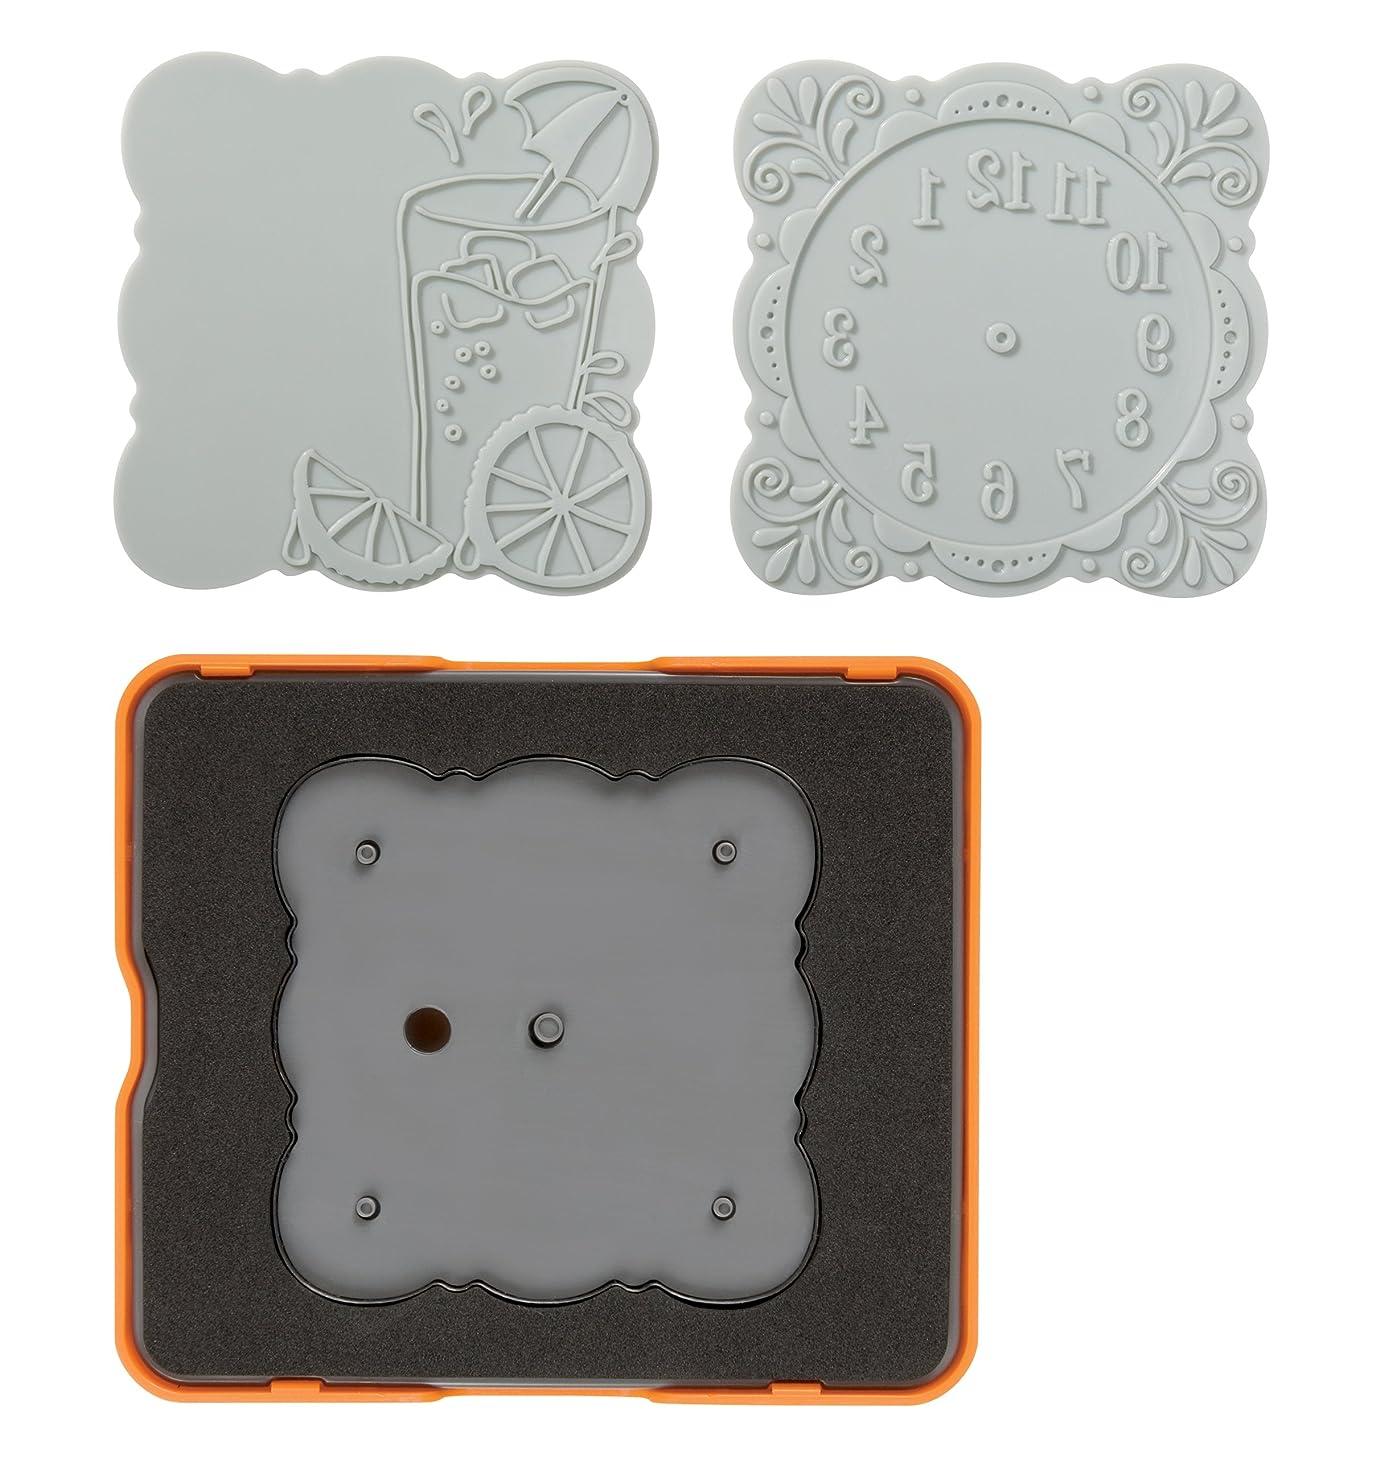 Fiskars 101890-1001 Curvy Square Design Set, Complex Pattern, Medium